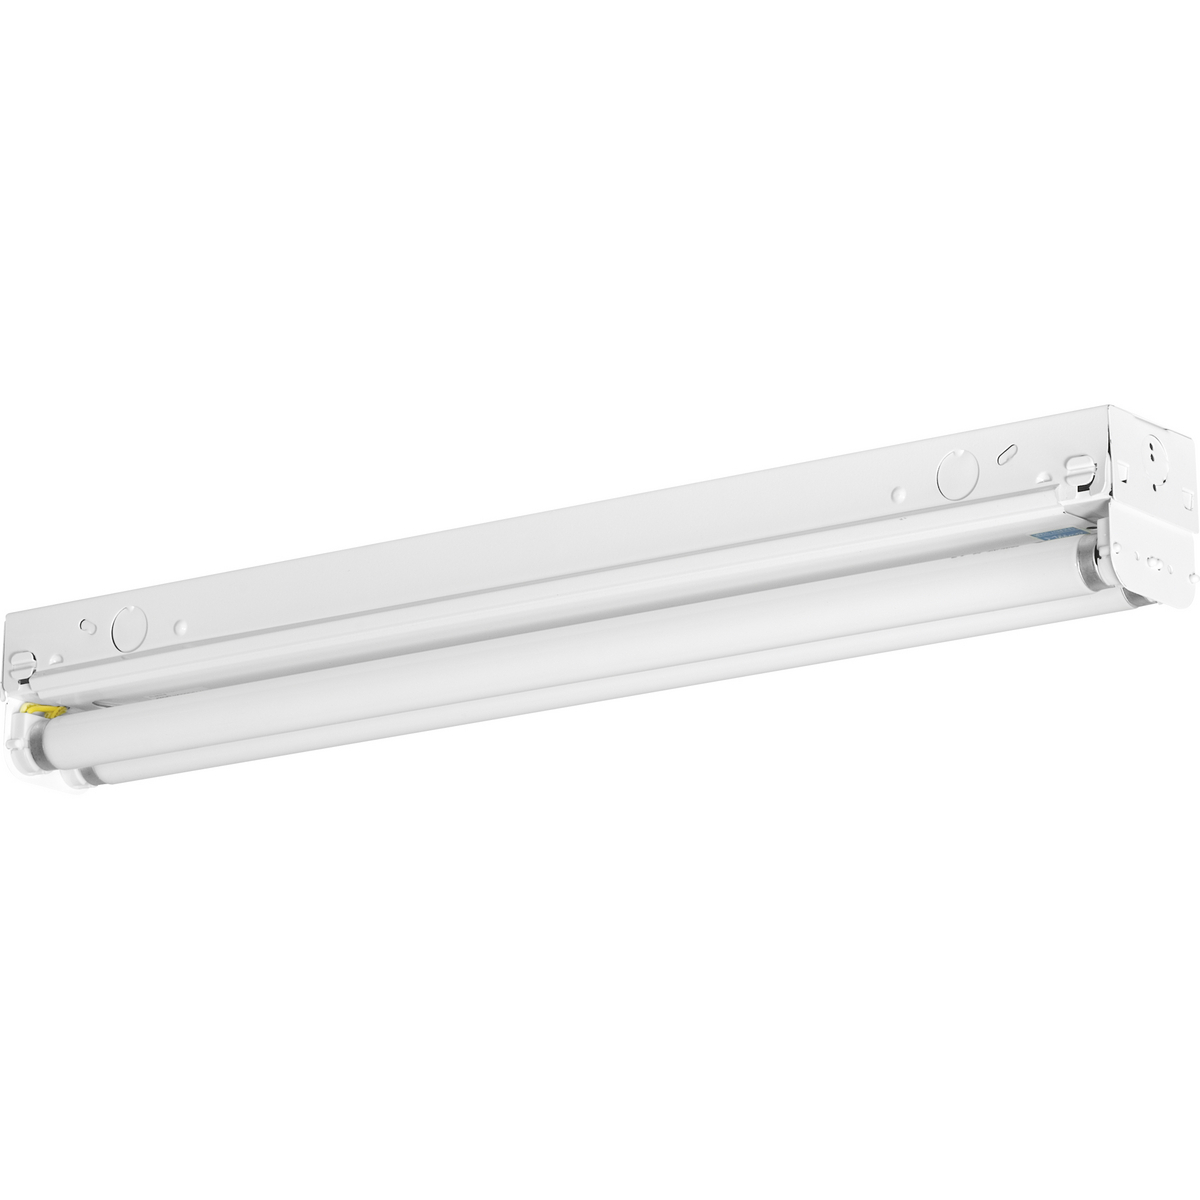 PRO P7266-30EB Two Light White Fluorescent Light 2XF17T8